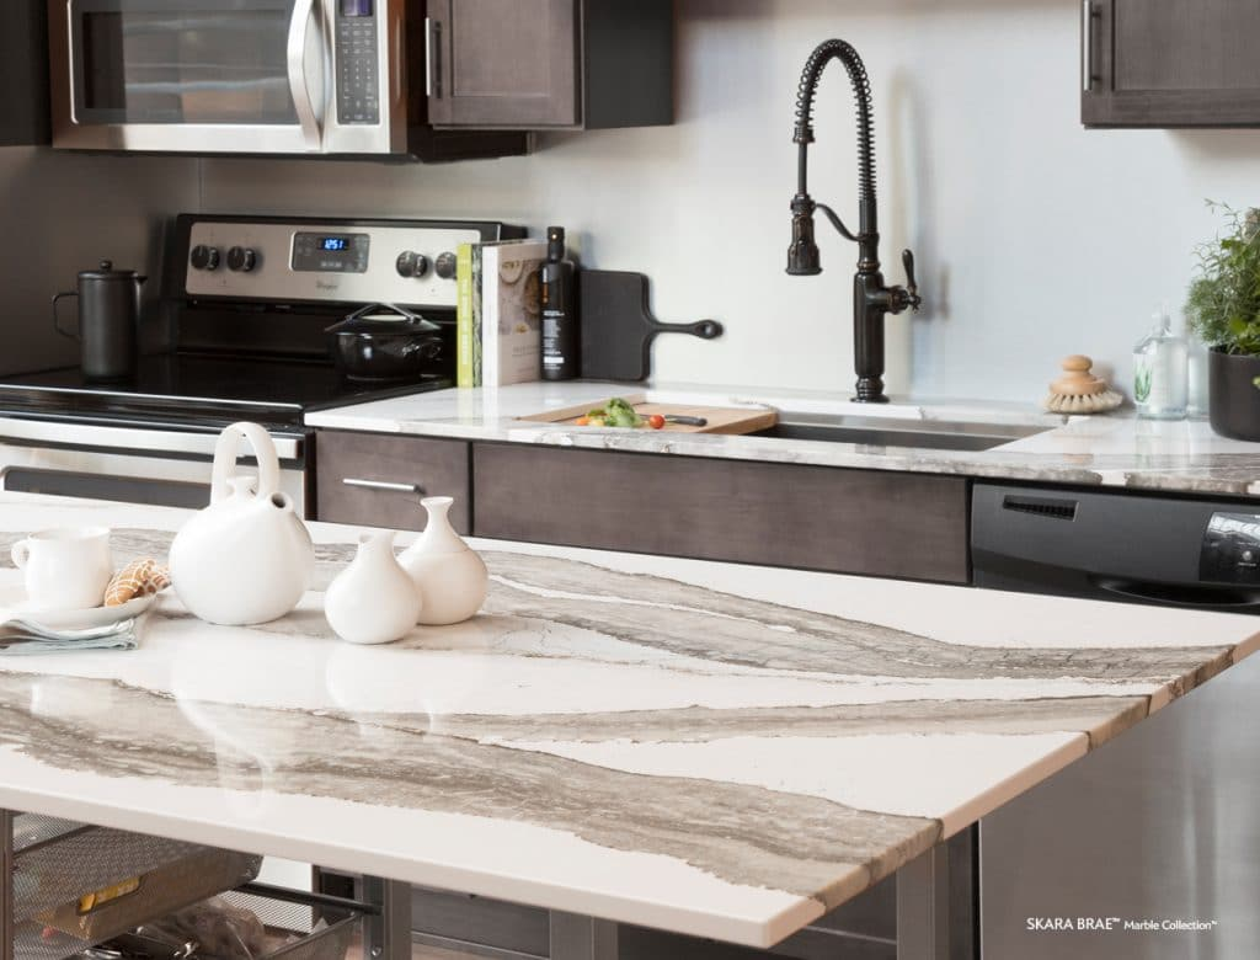 kitchen countertops installed in Atlanta